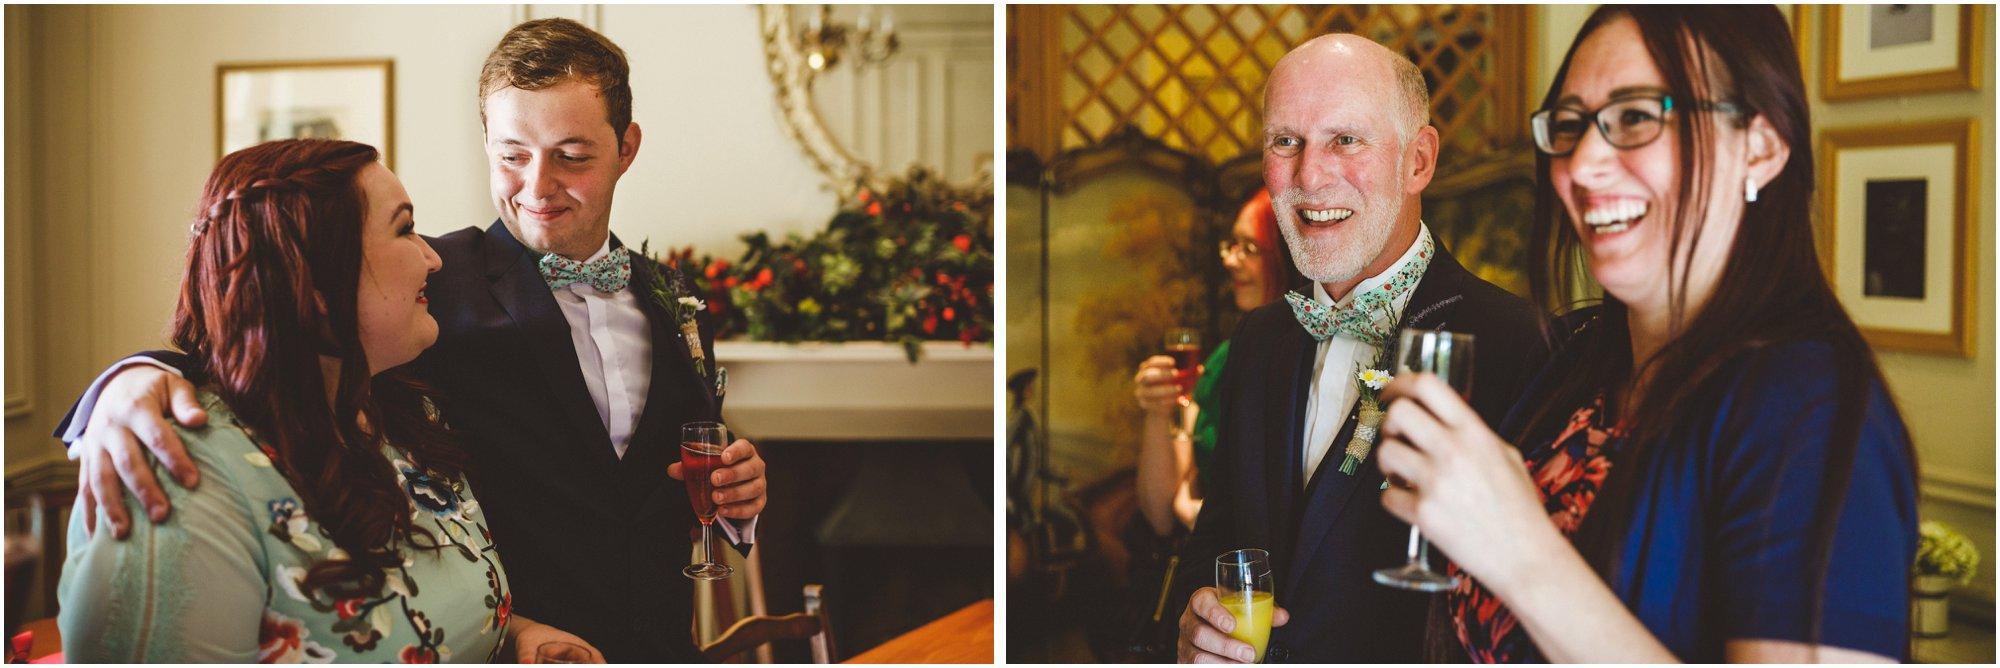 pavilion-hotel-wedding-york_0049.jpg